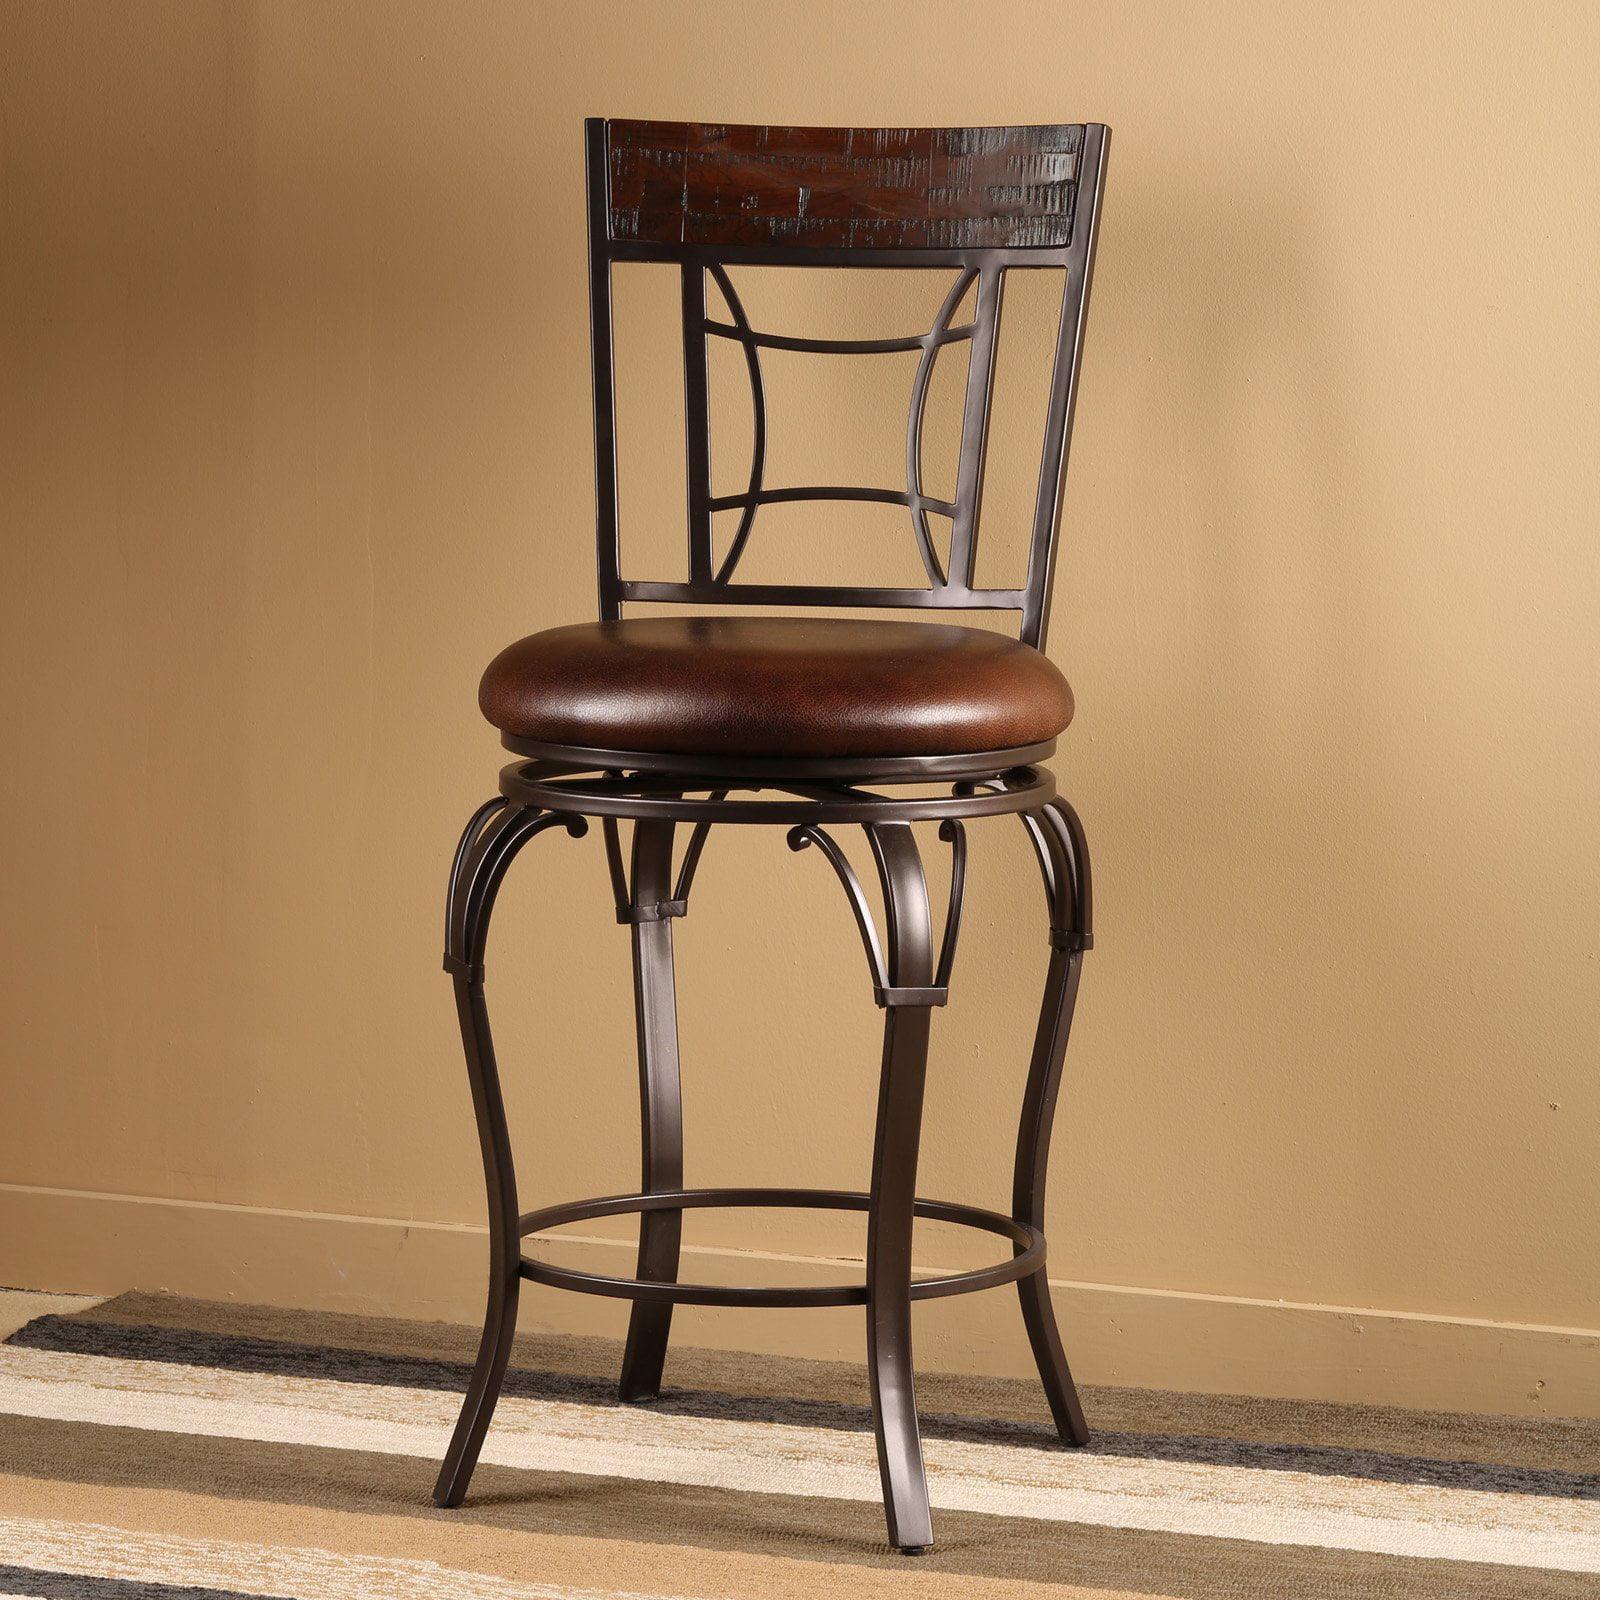 "Hillsdale Furniture Granada 41.75"" Swivel Counter Stool, Dark Chestnut Finish Wood/Brown Finish Metal"